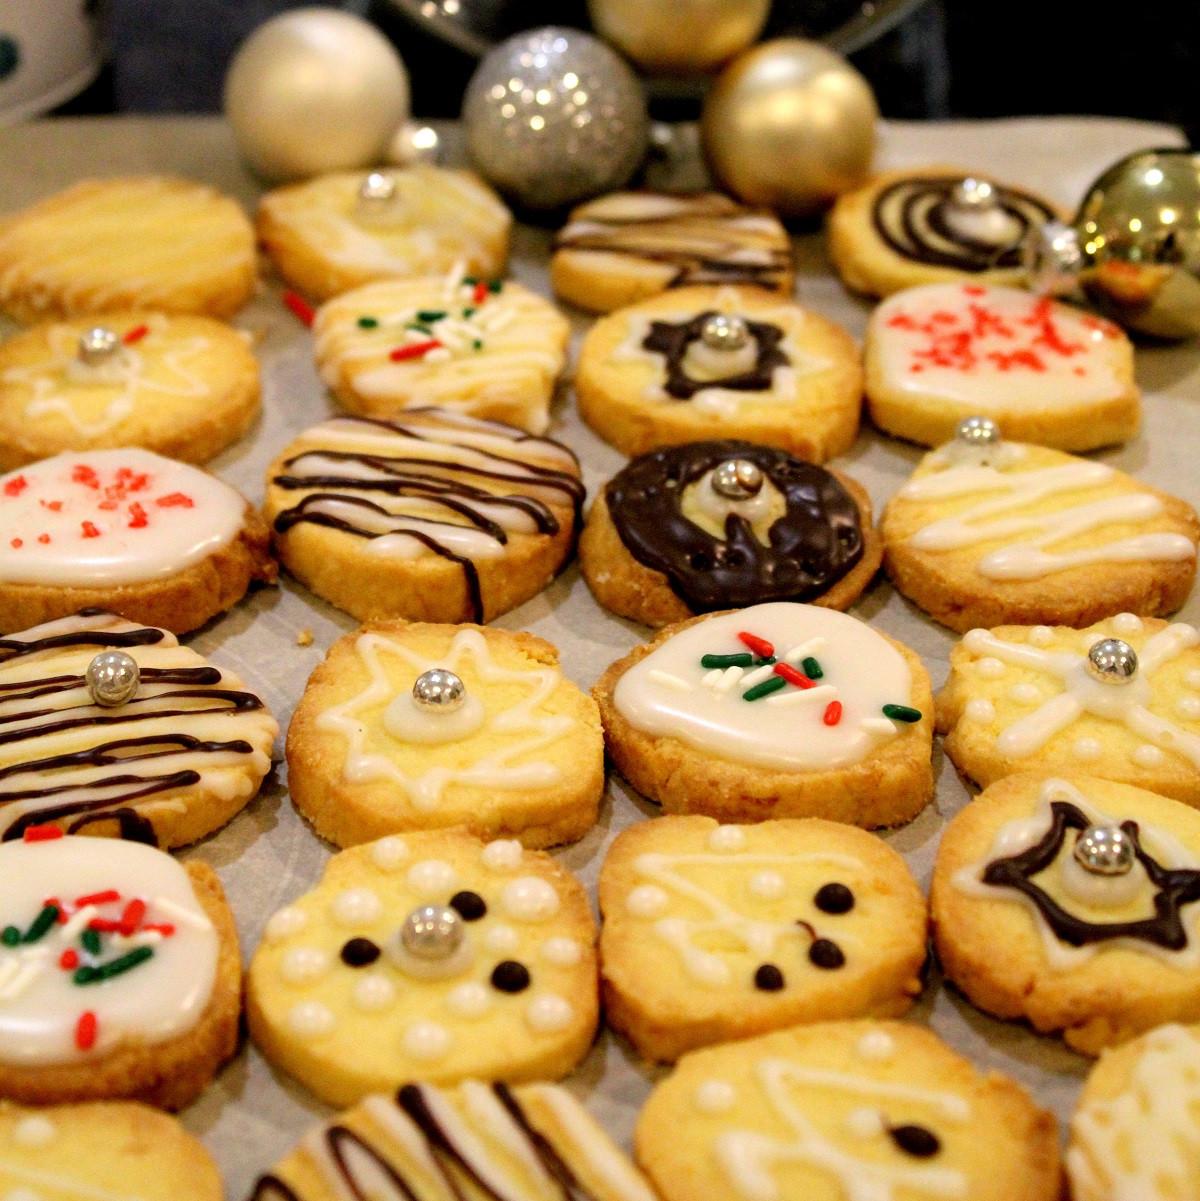 Lemon Christmas Cookies  FoodInspires – Professional Chef Services – 2014